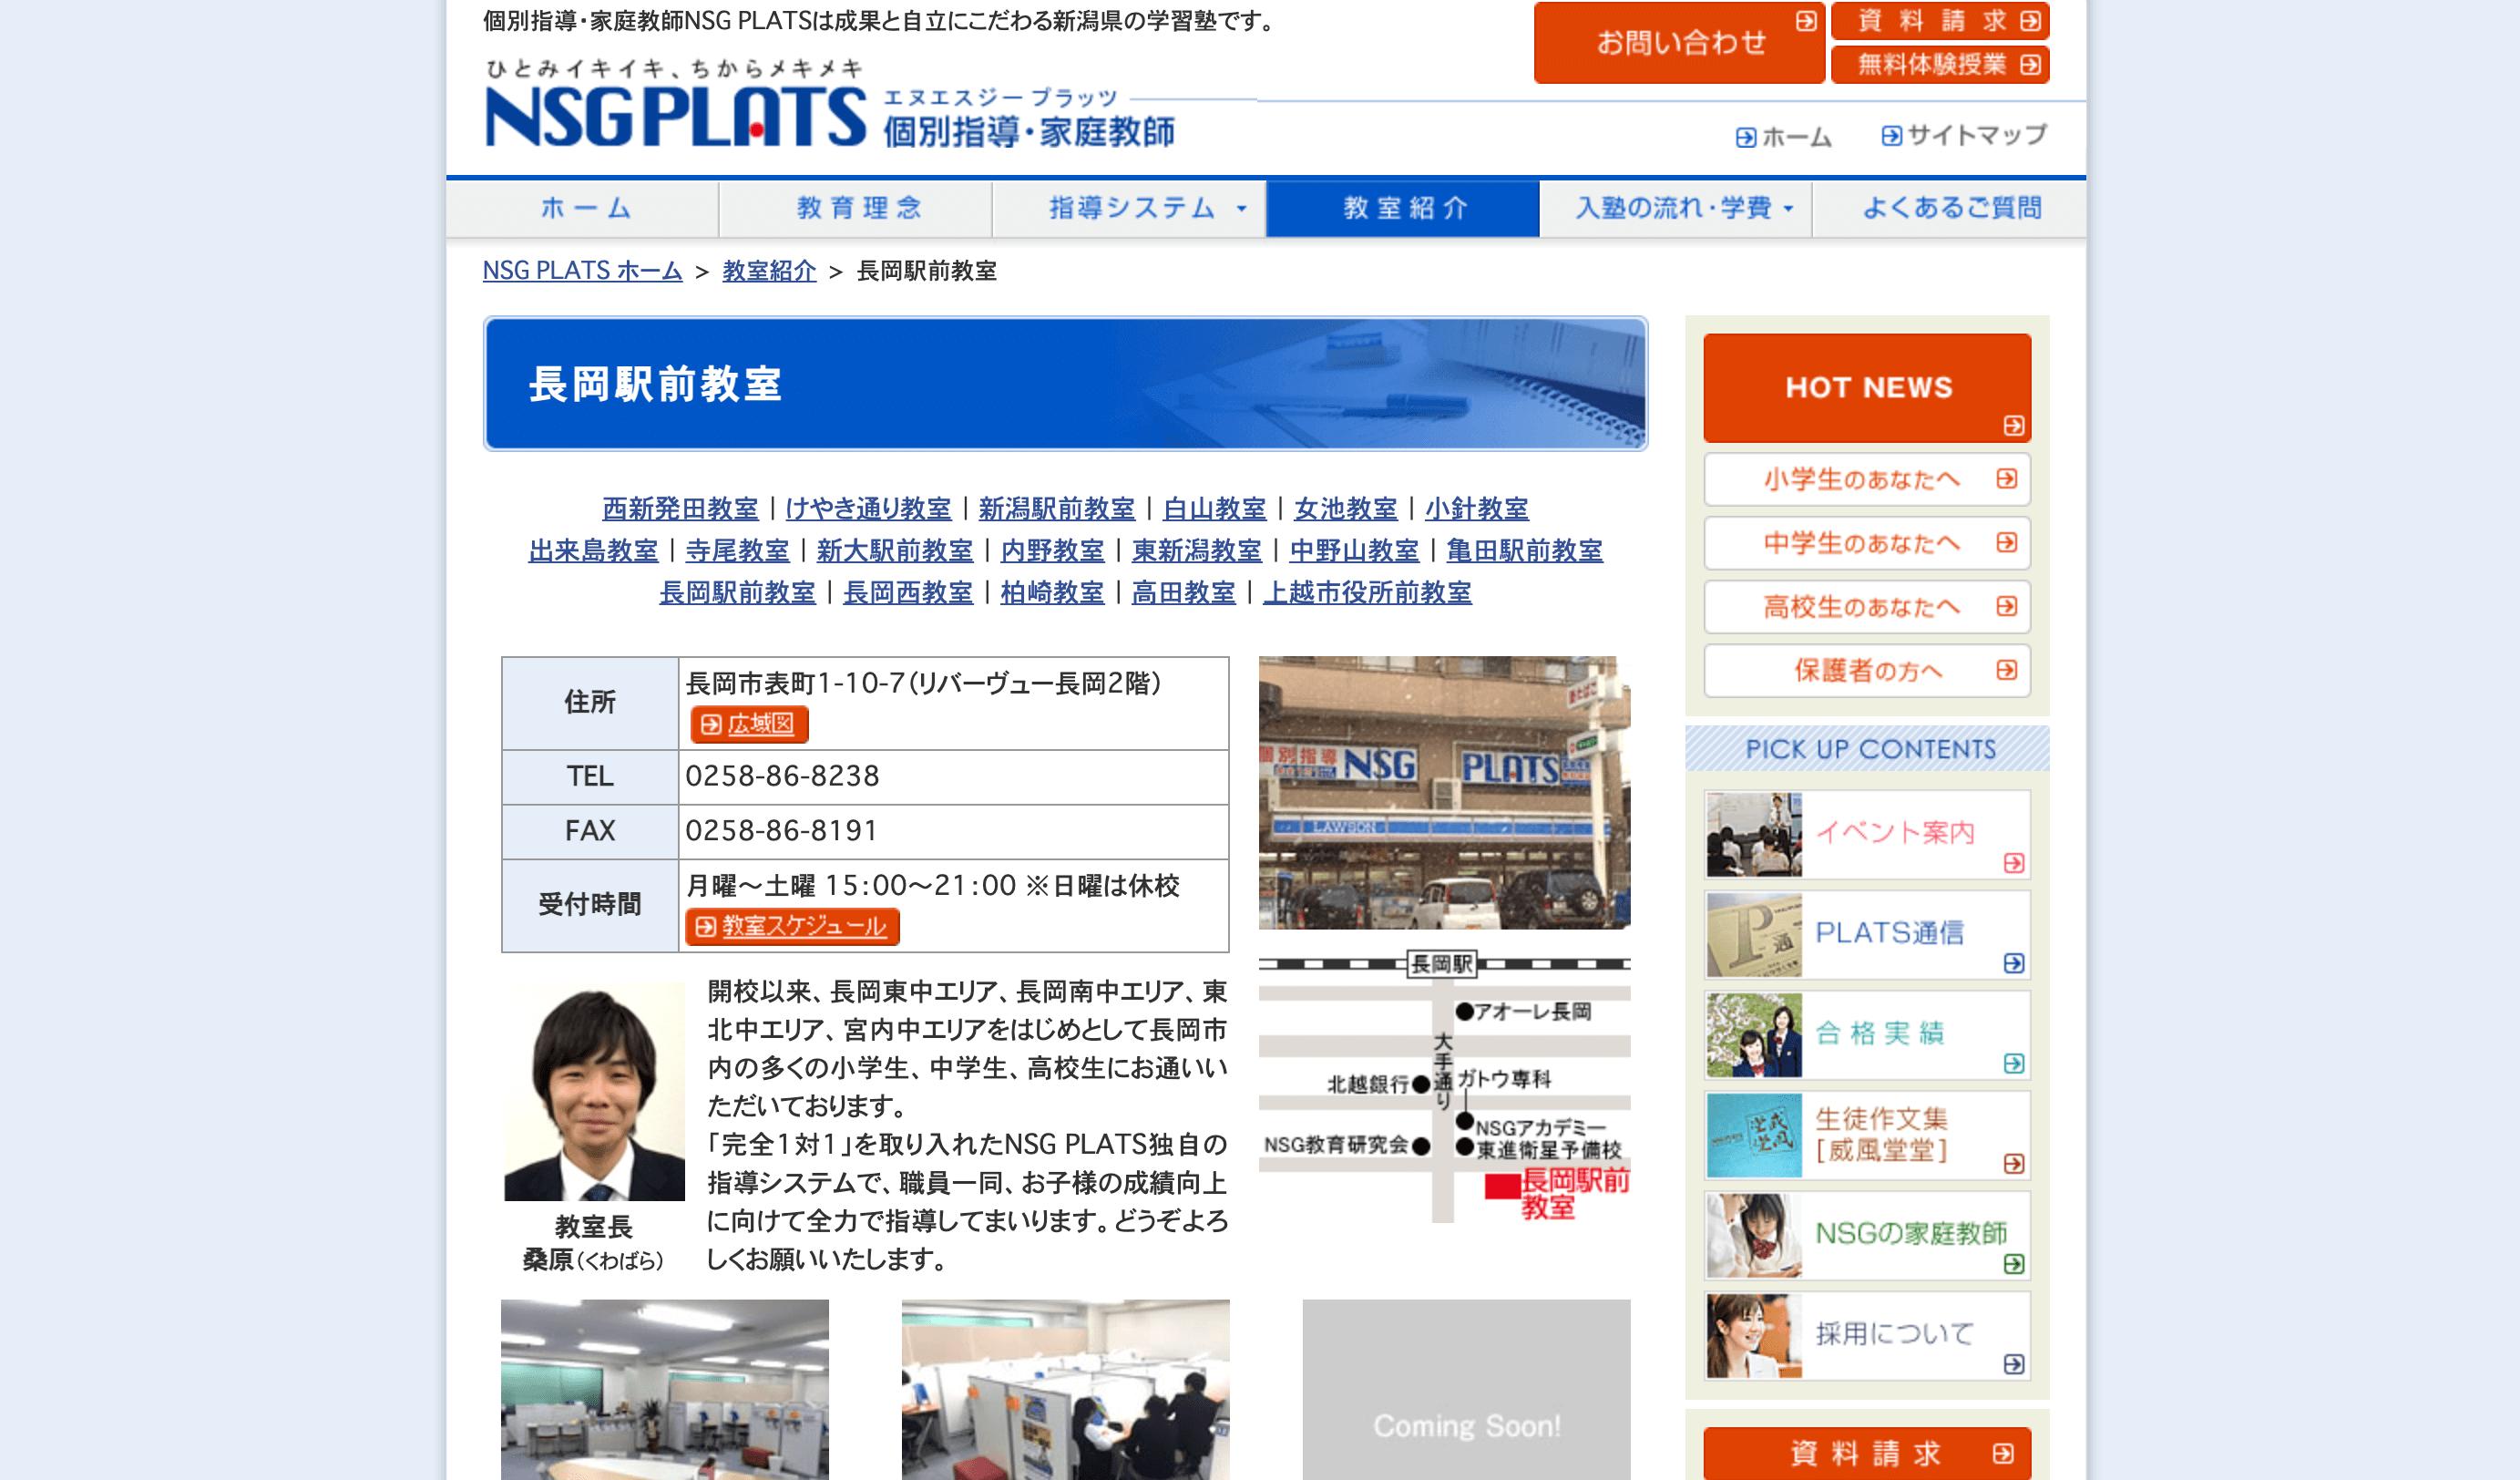 長岡NSGPLATS